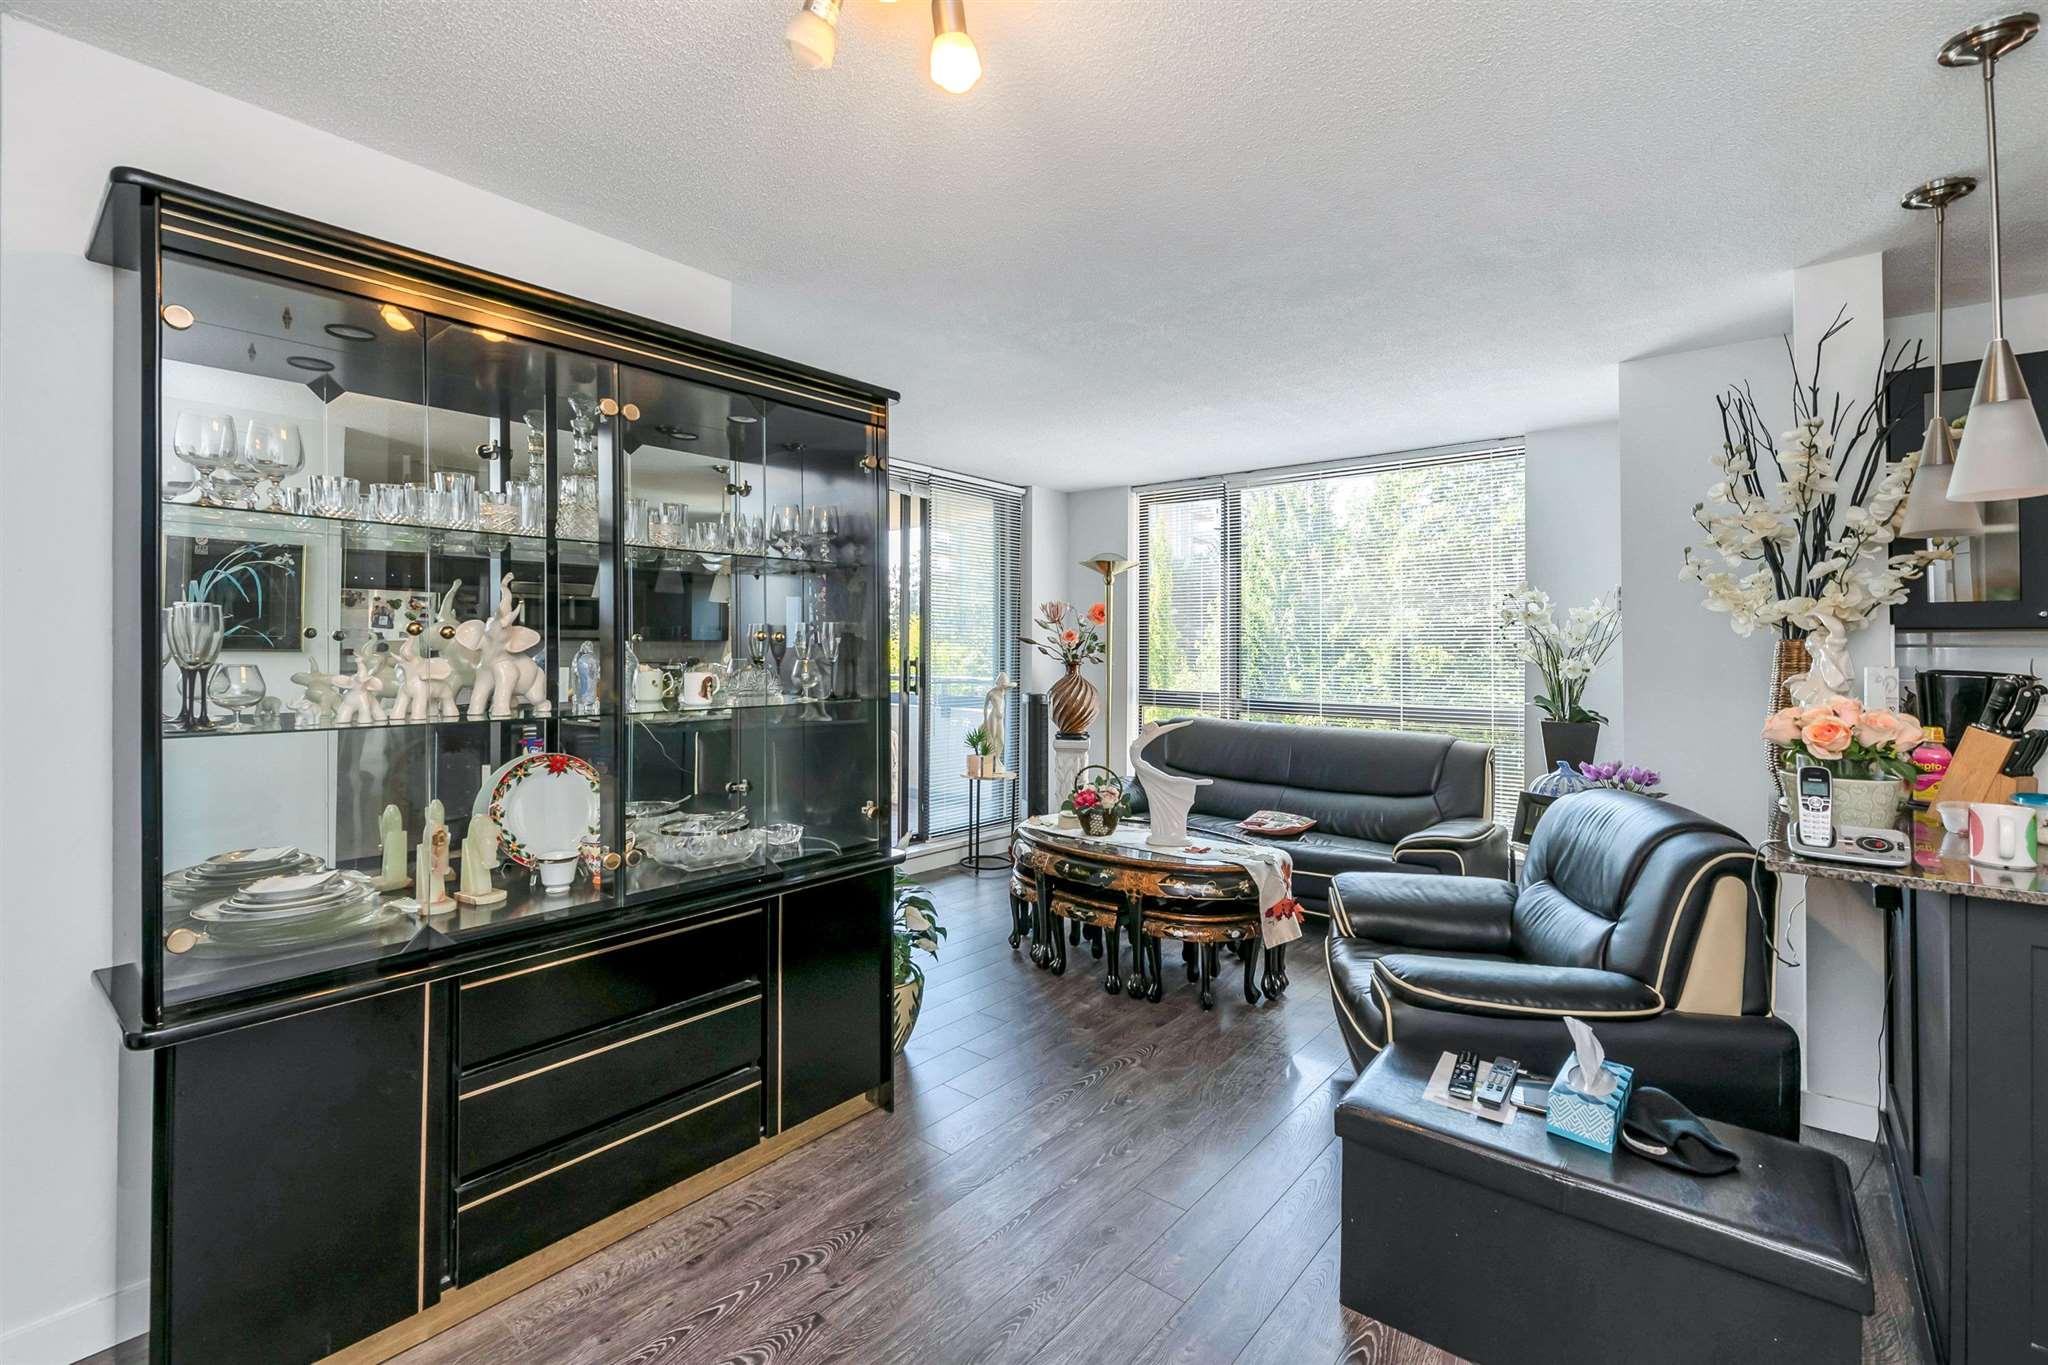 205 7225 ACORN AVENUE - Highgate Apartment/Condo for sale, 2 Bedrooms (R2606454) - #1